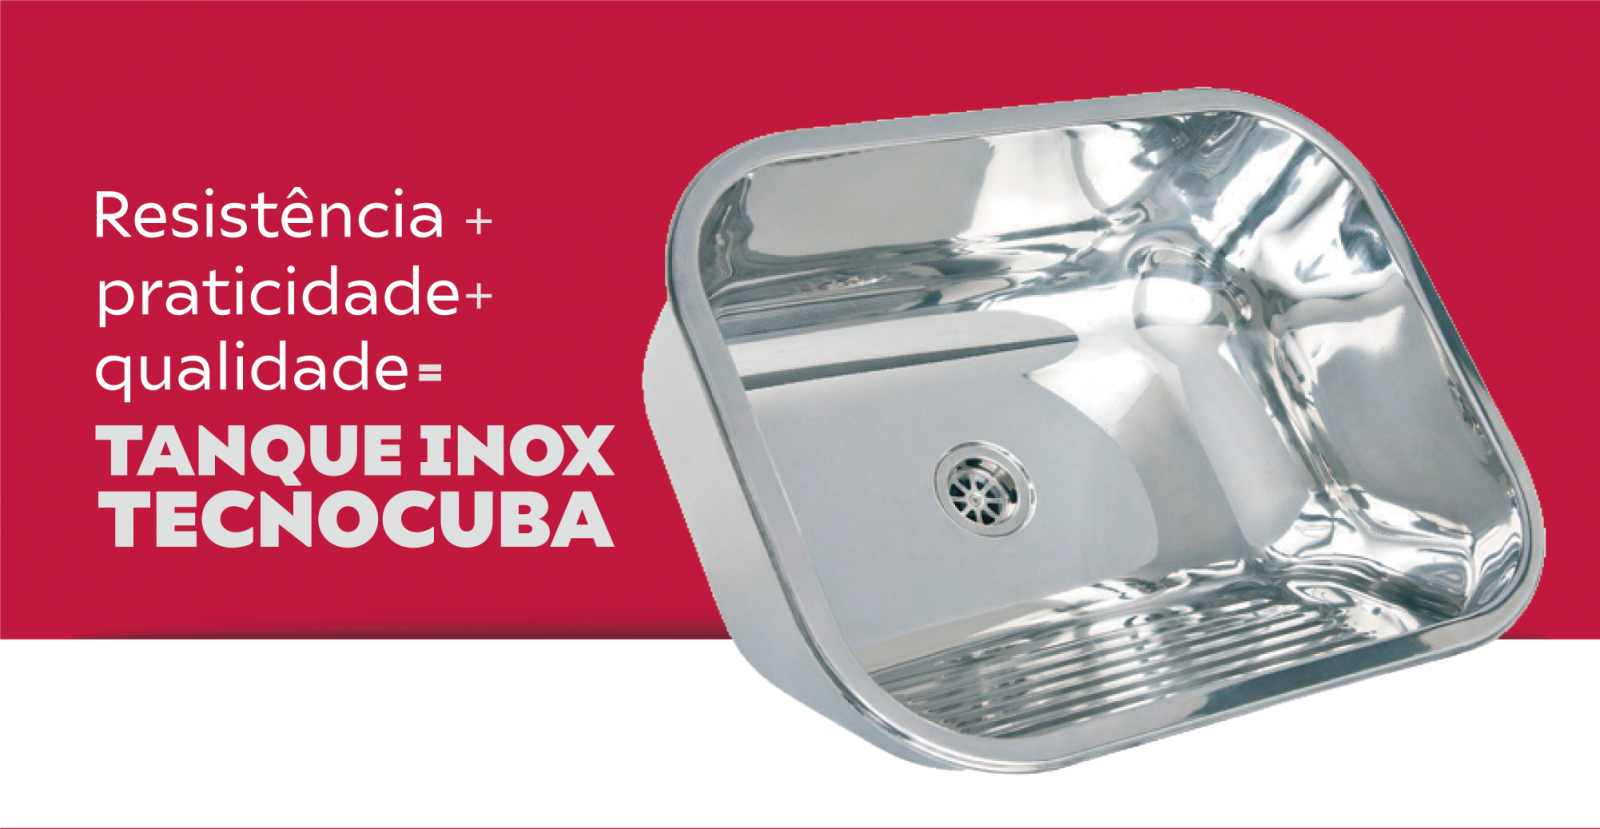 Tanque Inox Tecnocuba 50x40x22cm 25 litros com válvula